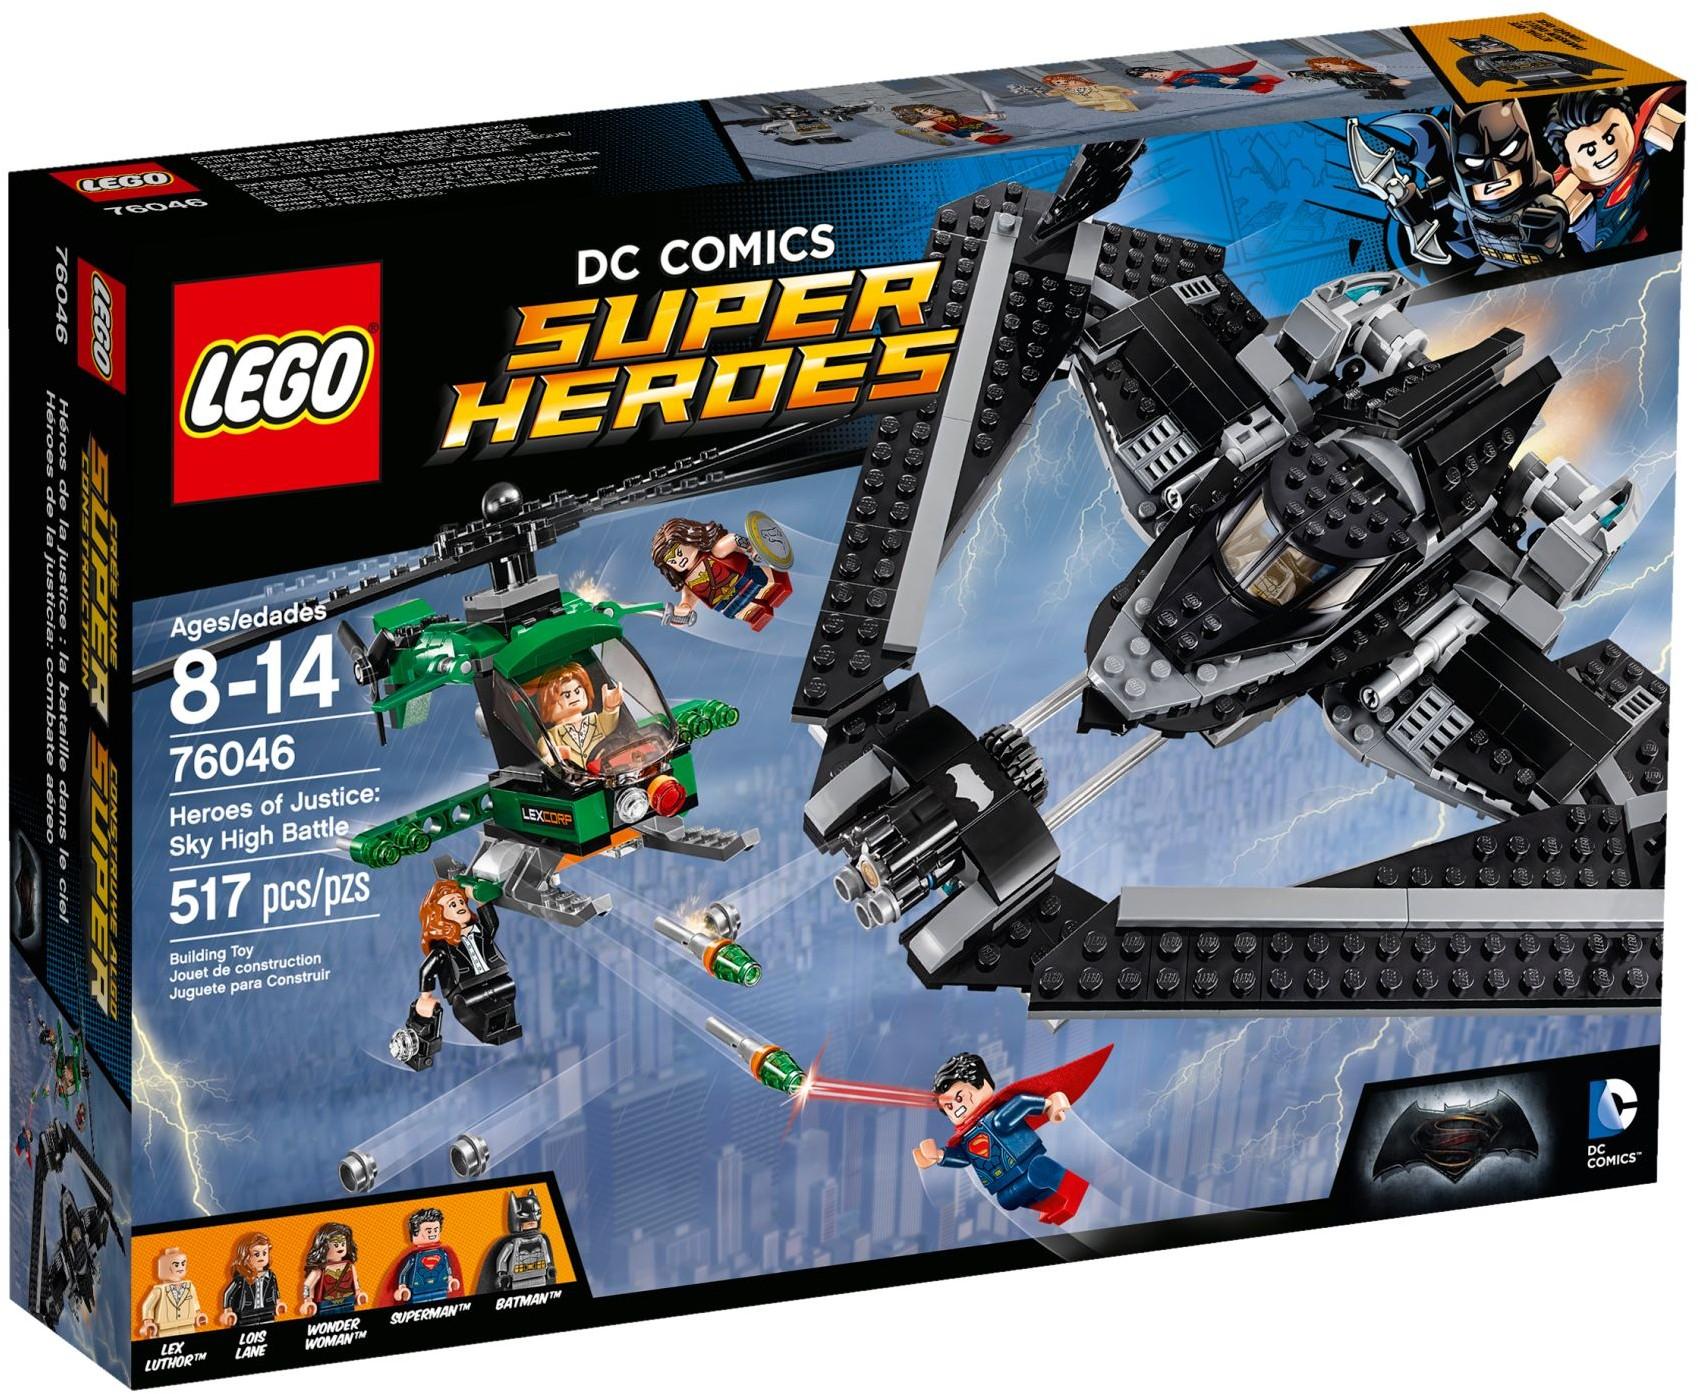 LEGO 76046 - Super Heroes - Heroes of Justice: Sky High Battle